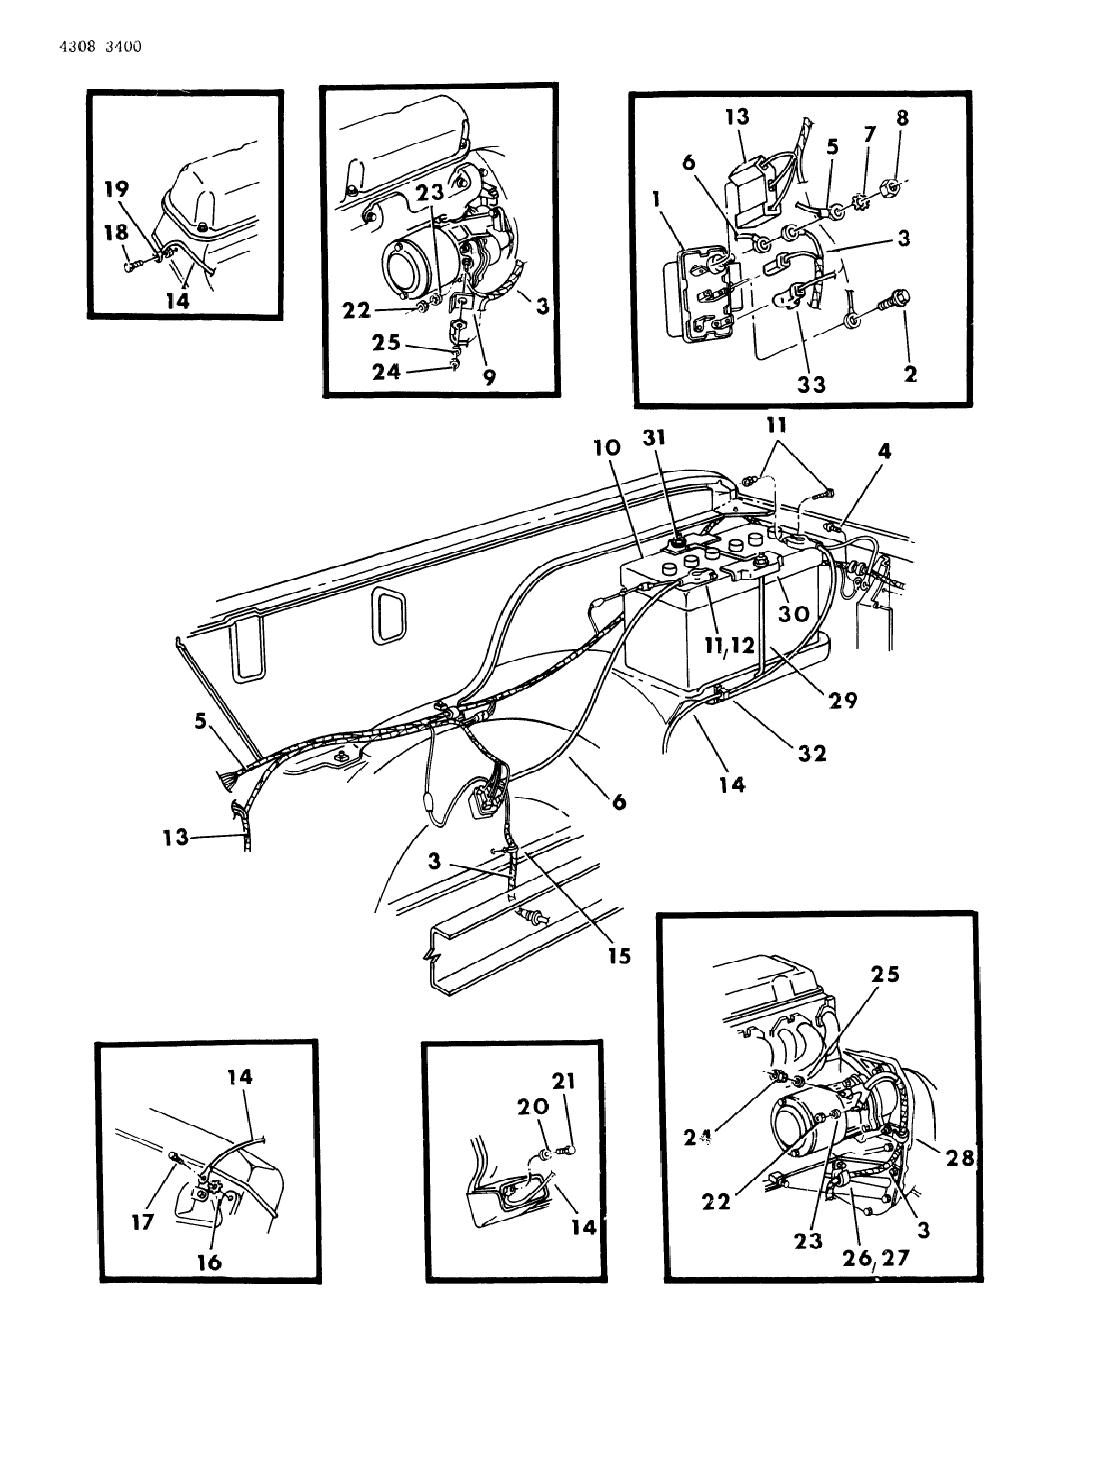 1985 Dodge D150 Wiring - Battery & Starter